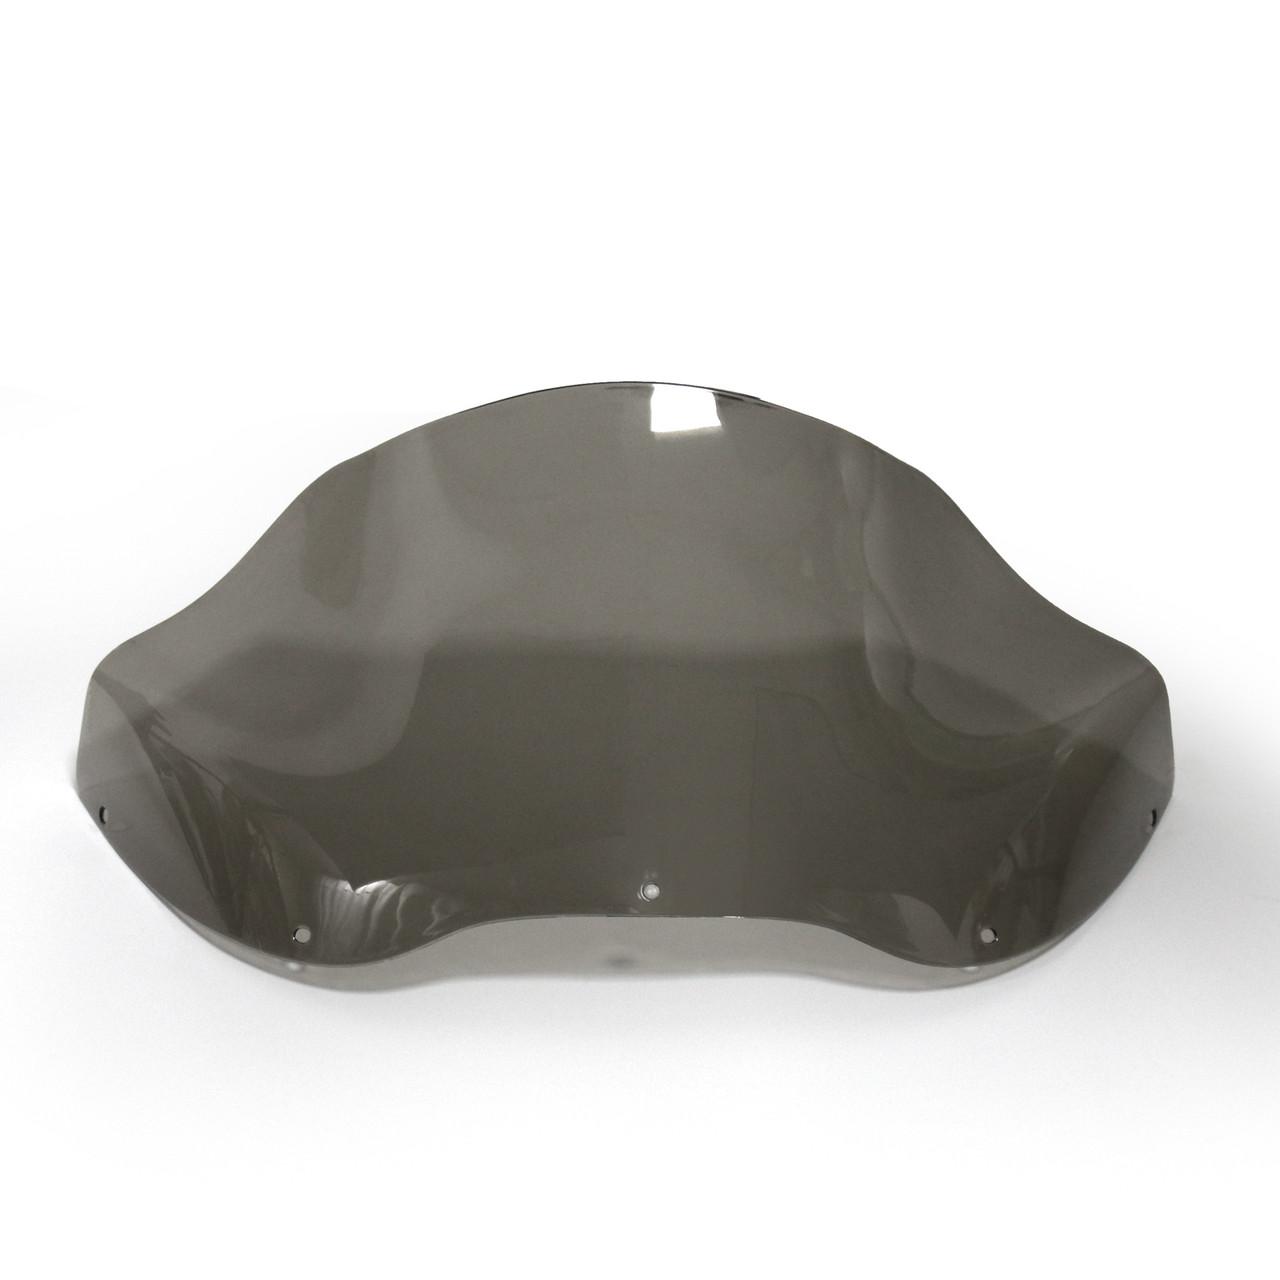 Windshield Windscreen 13 inch Fairing For Harley Road Glide FLTR (2008-2013) A